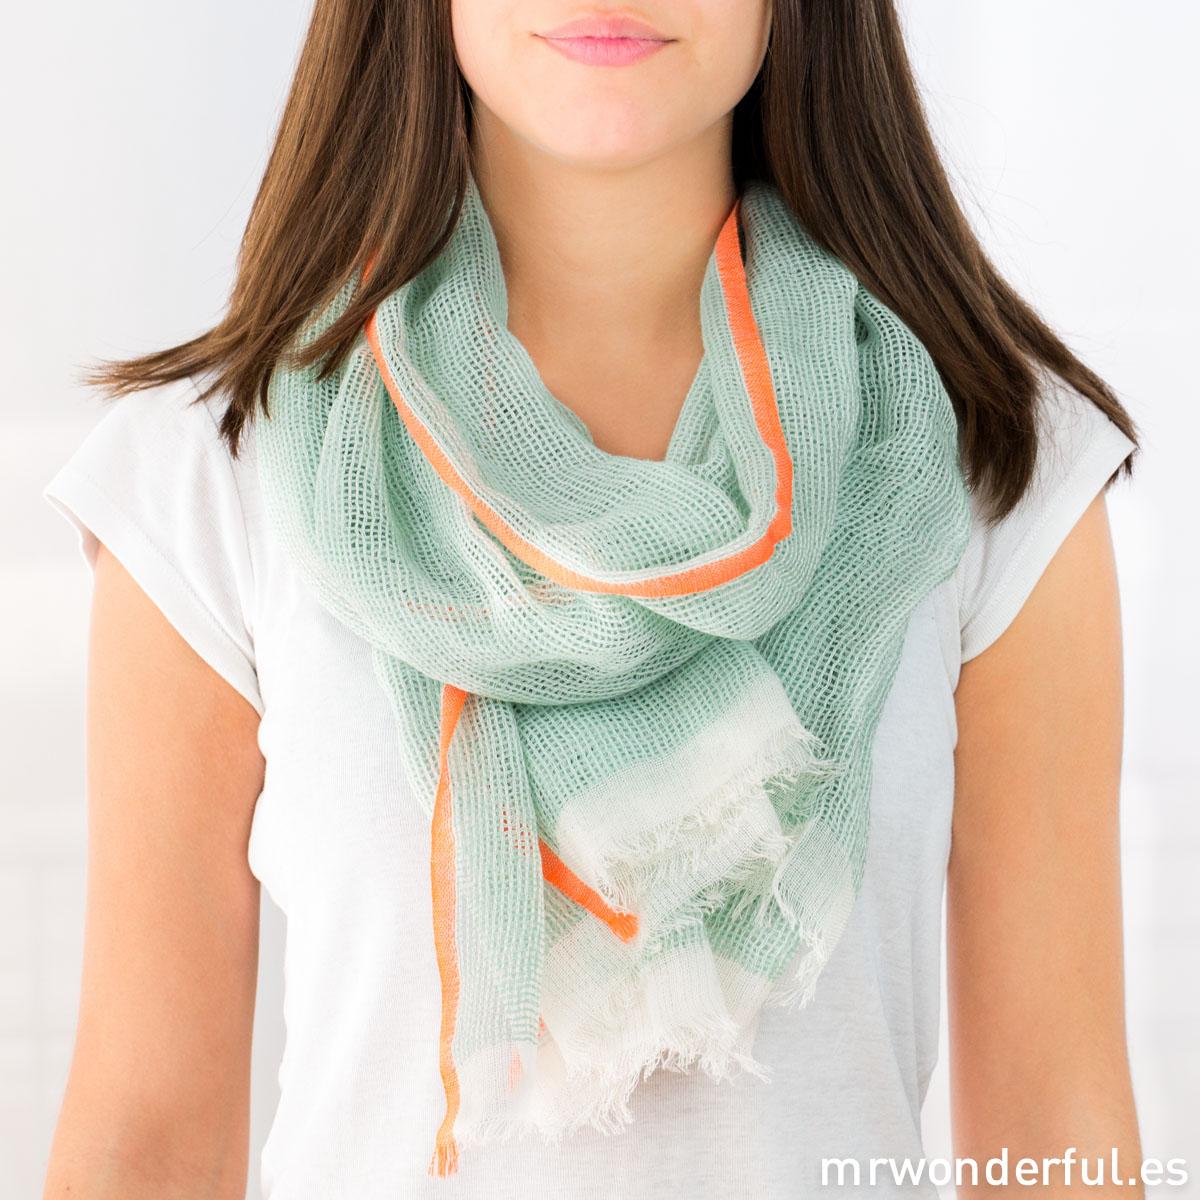 mrwonderful_SA0330_3_foulard-algodon_mint-fluor-3